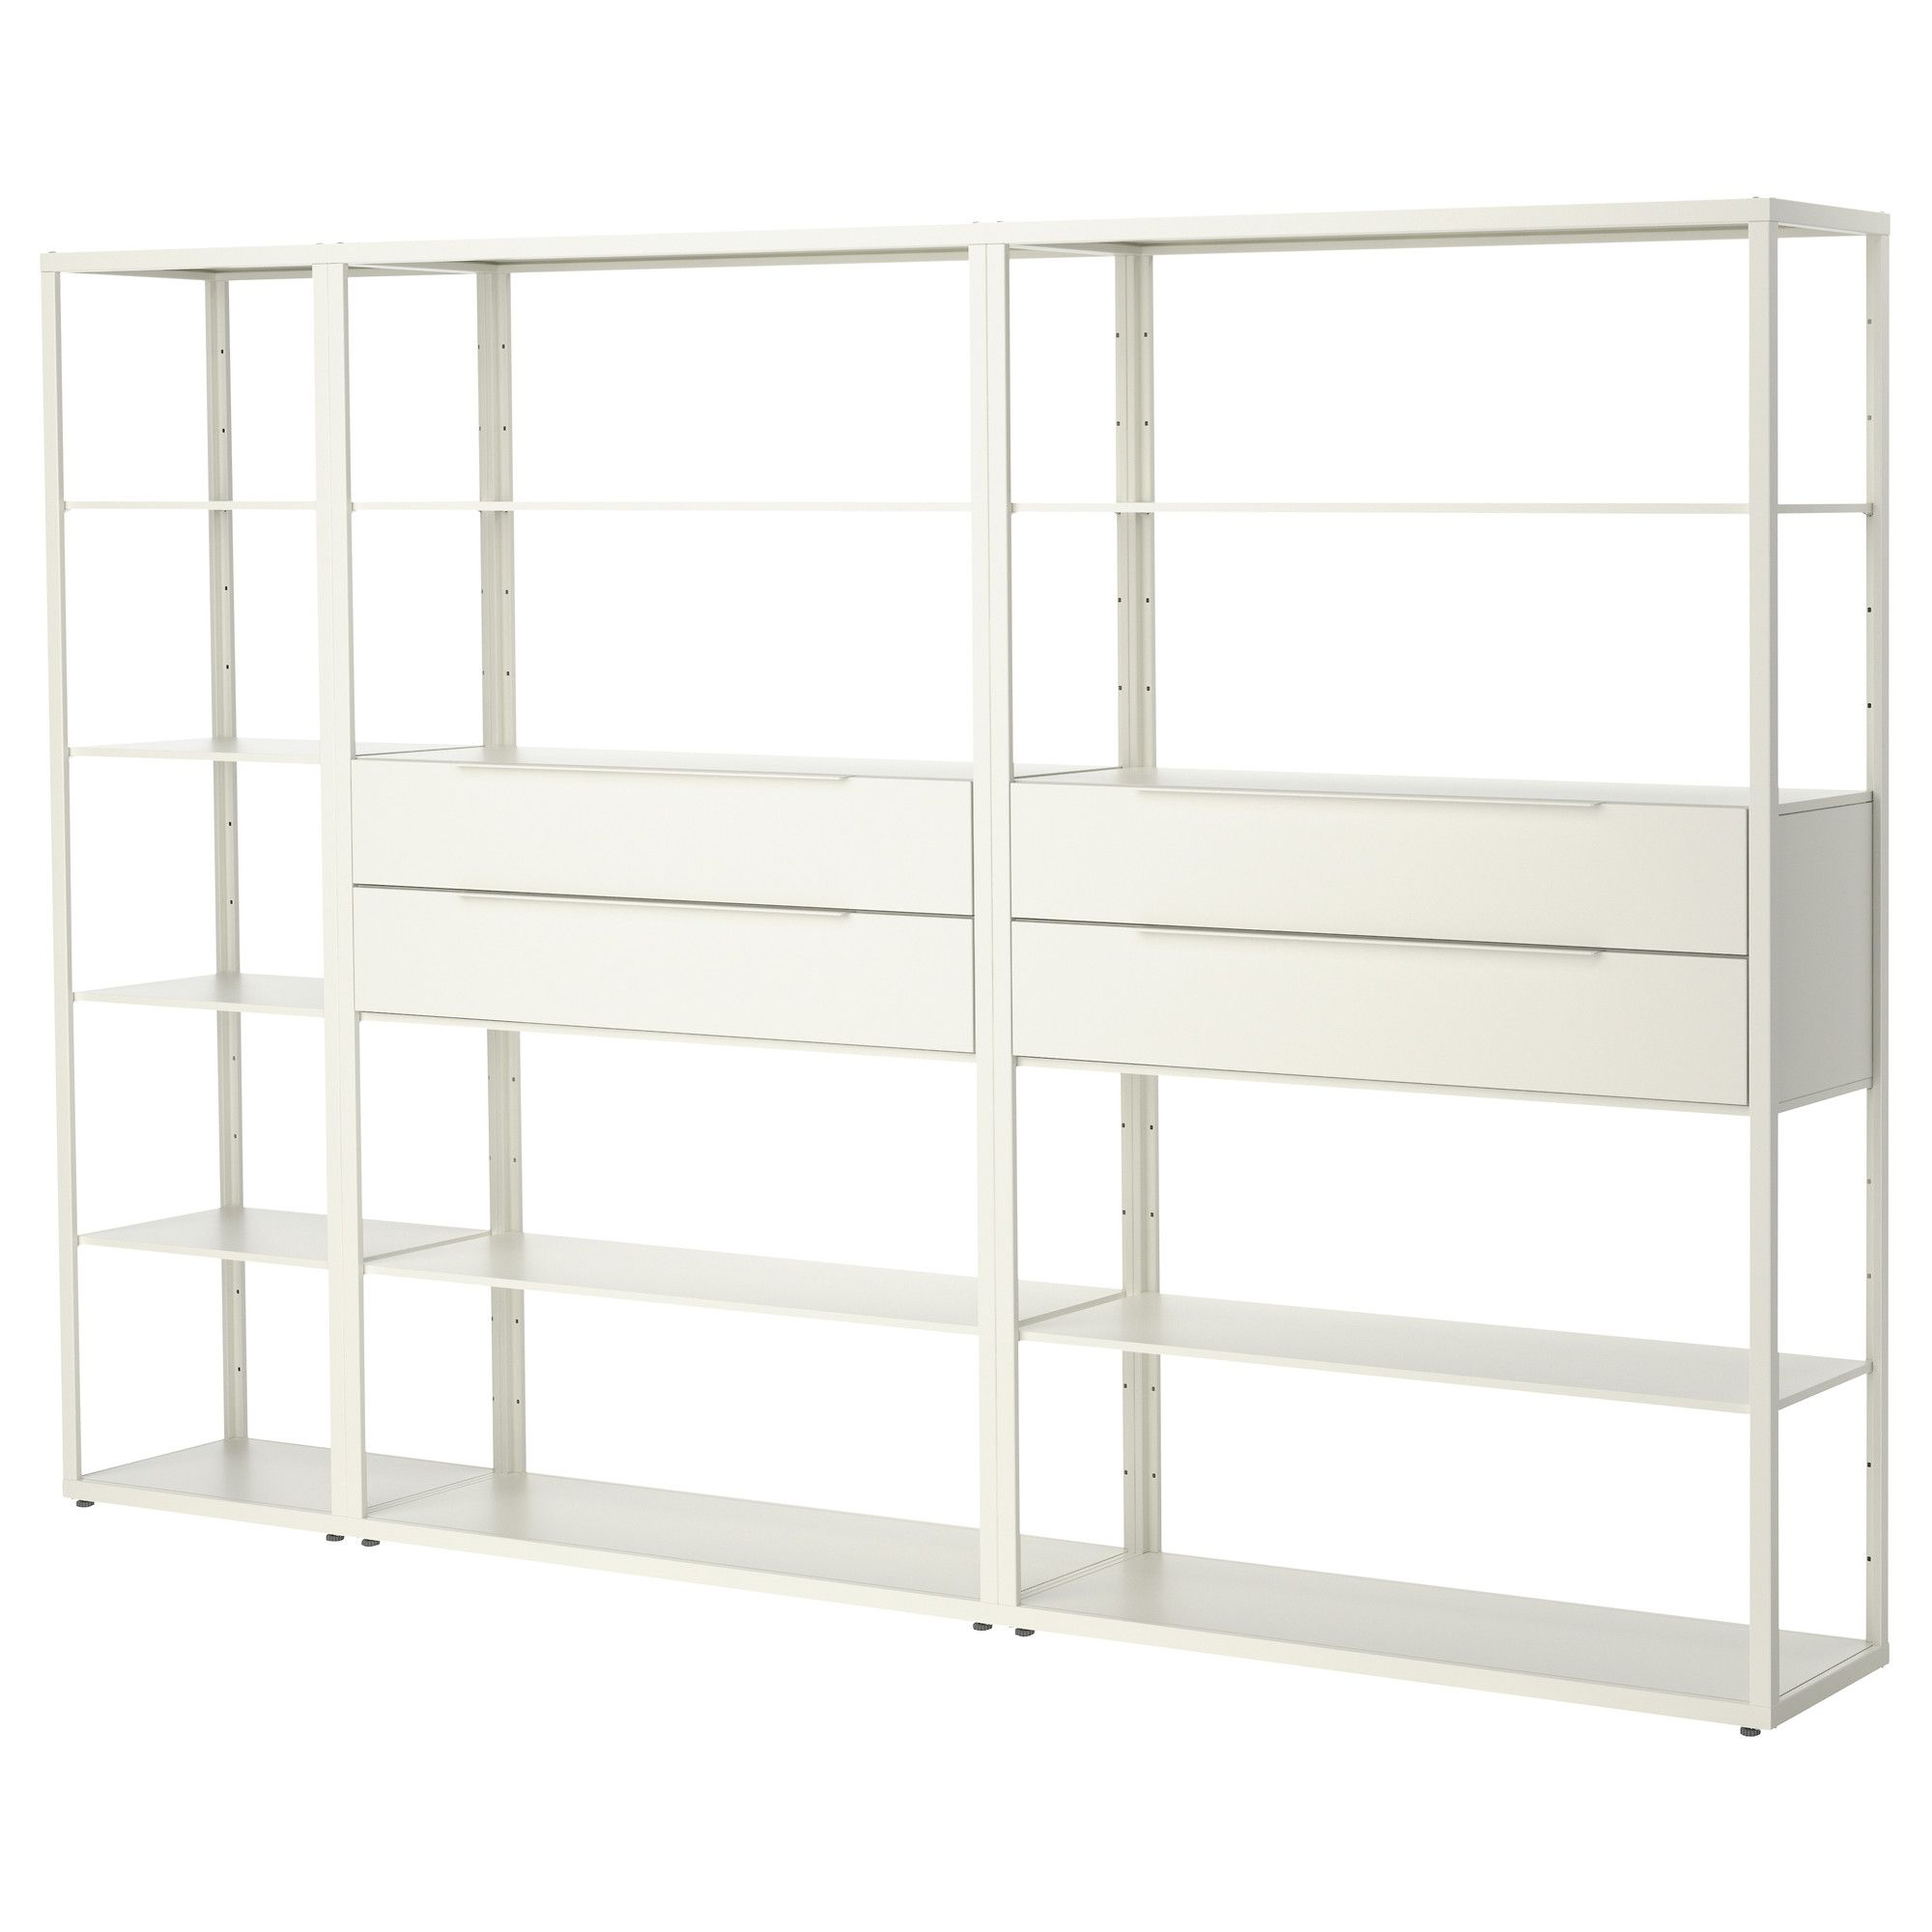 "FJ""LKINGE Shelving unit with drawers IKEA"